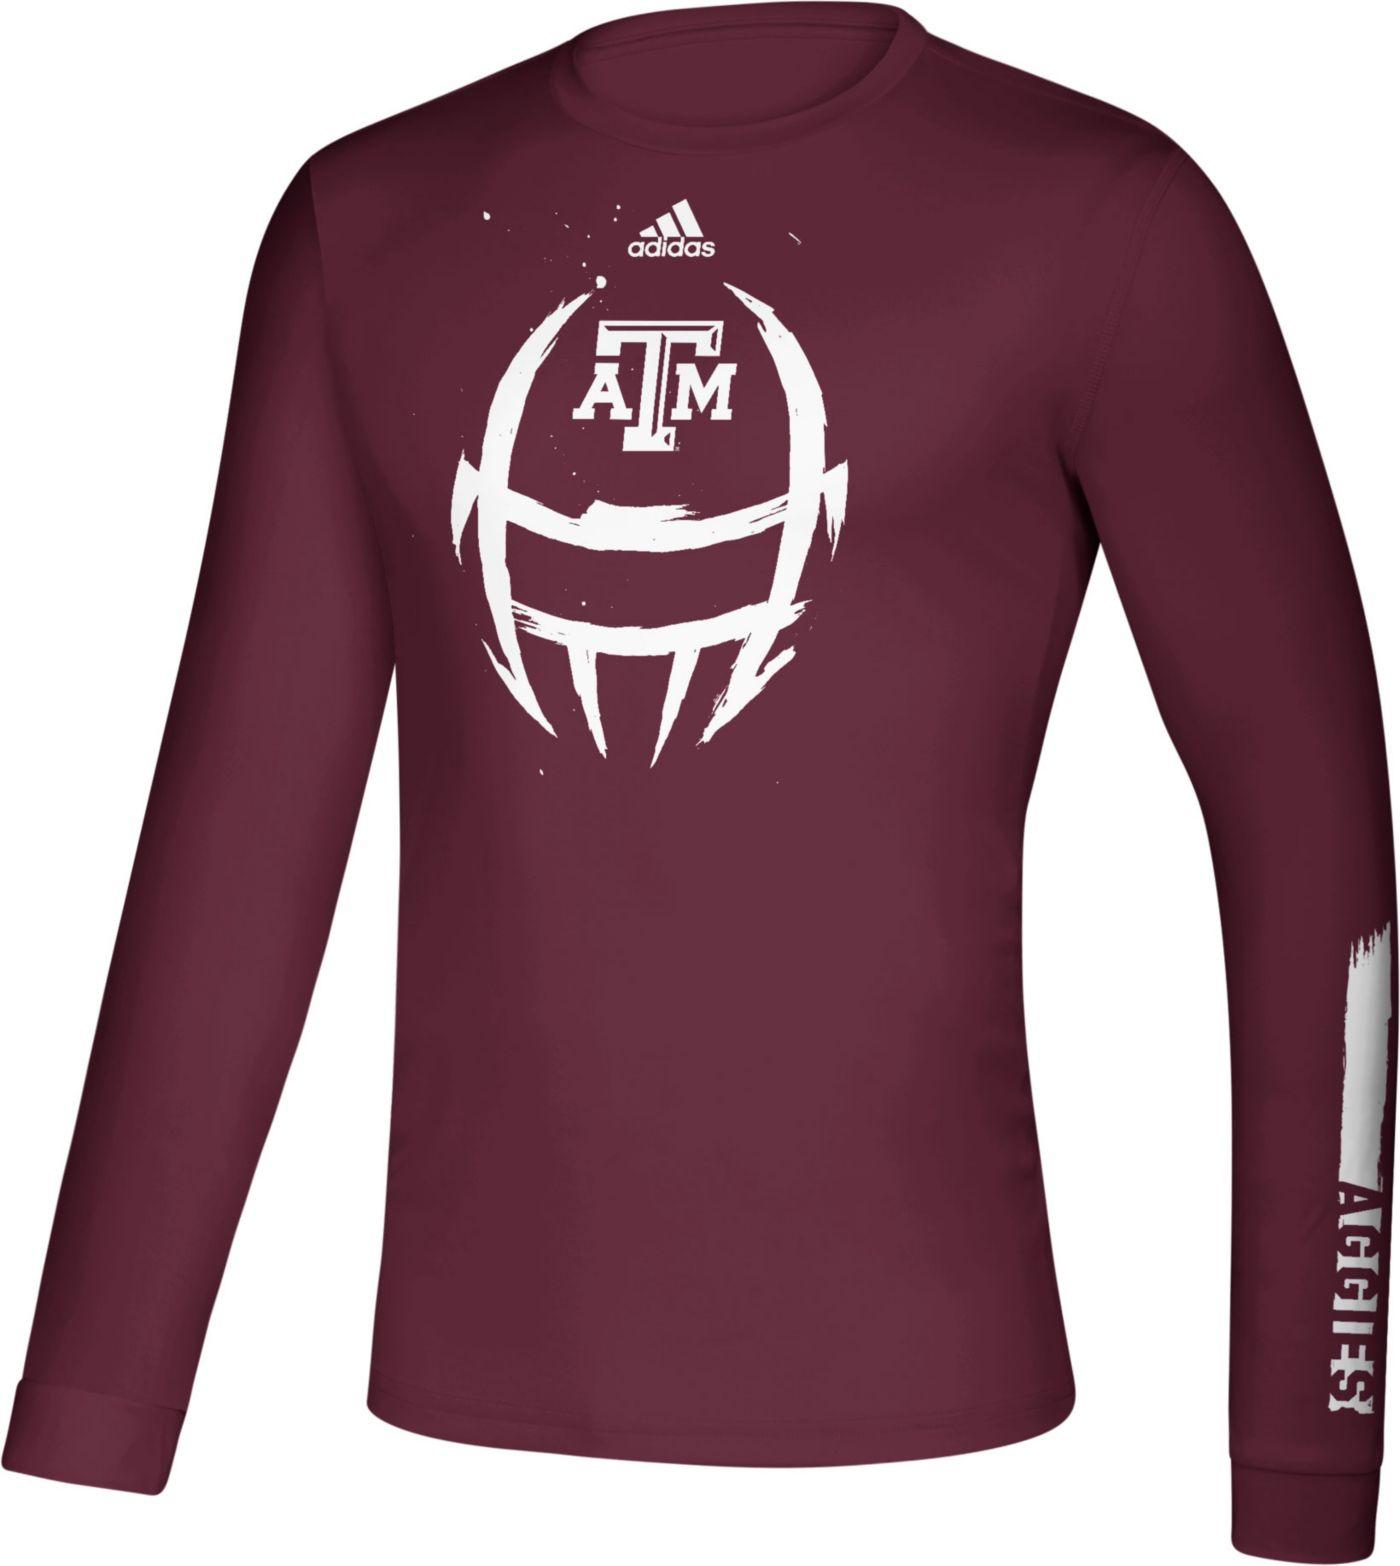 adidas Men's Texas A&M Aggies Maroon Locker Football Long Sleeve T-Shirt